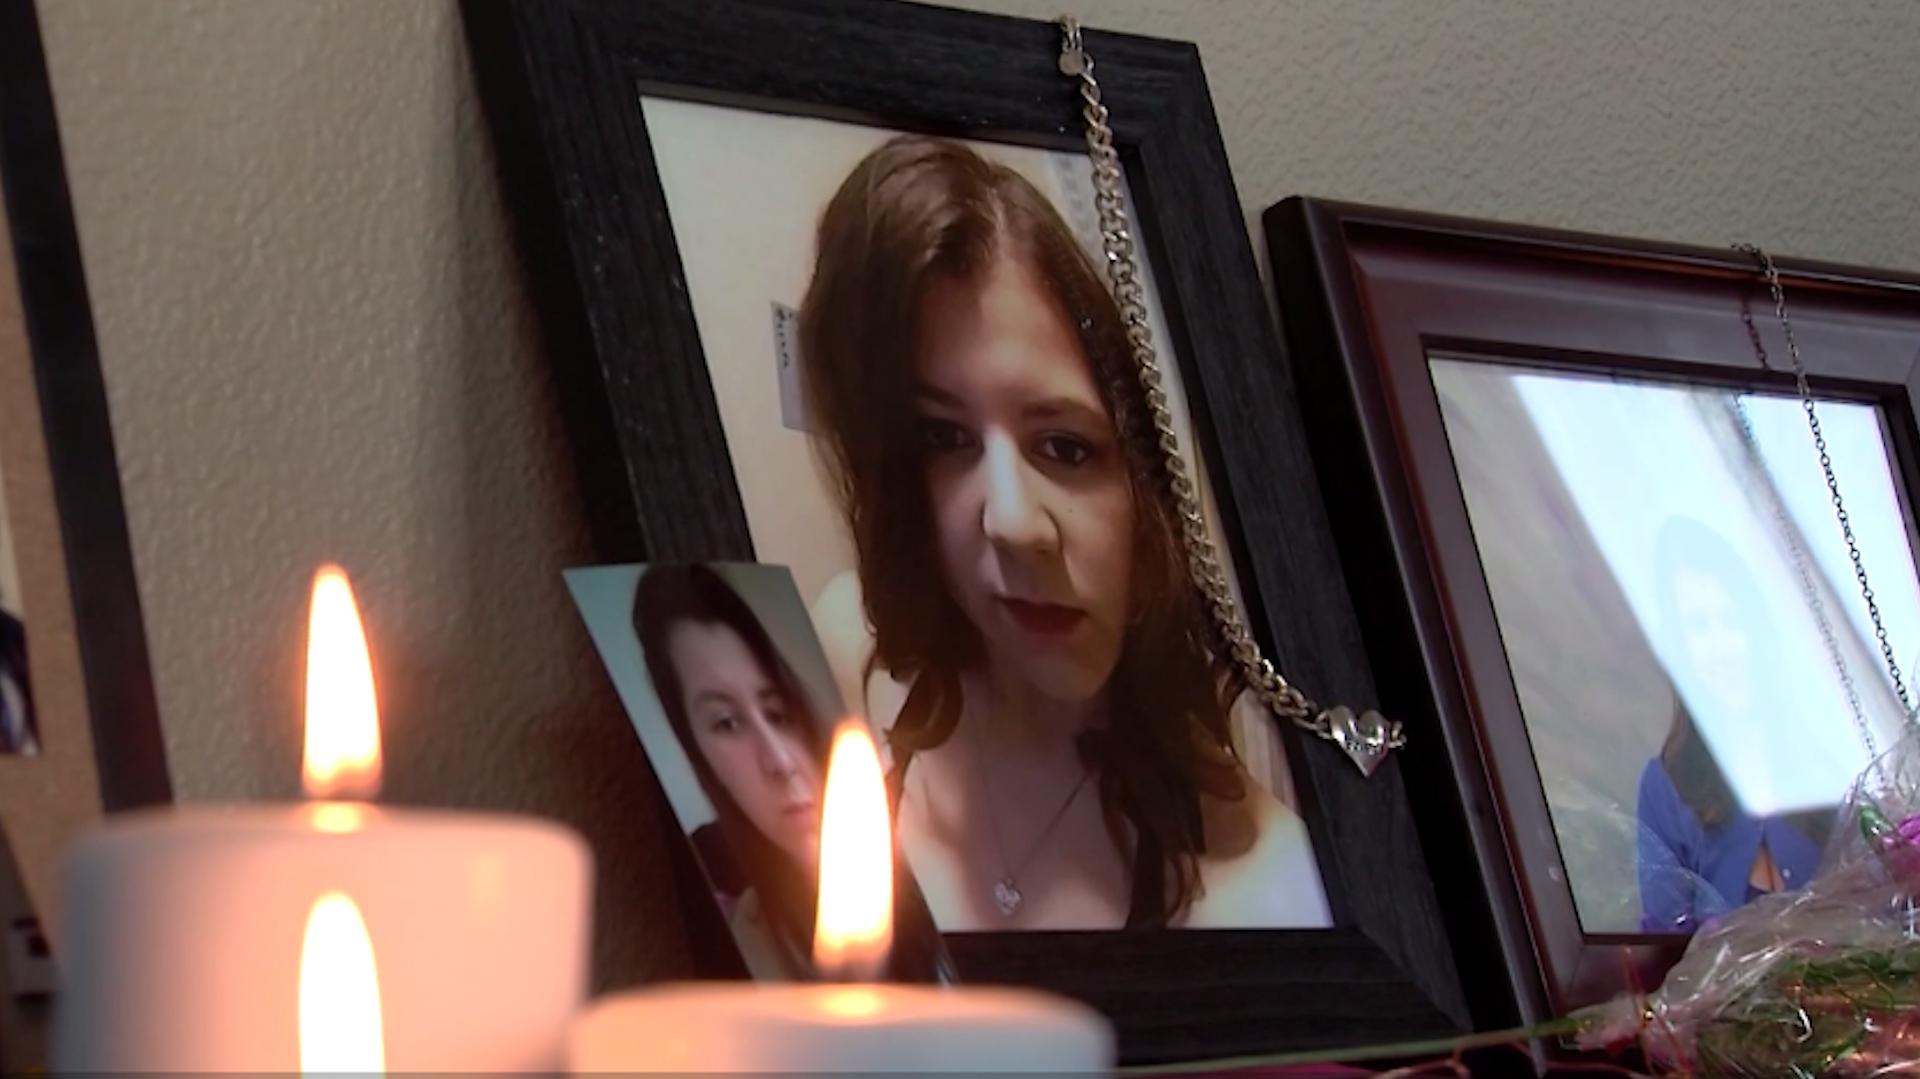 Alaskan teen allegedly murdered by friends for money